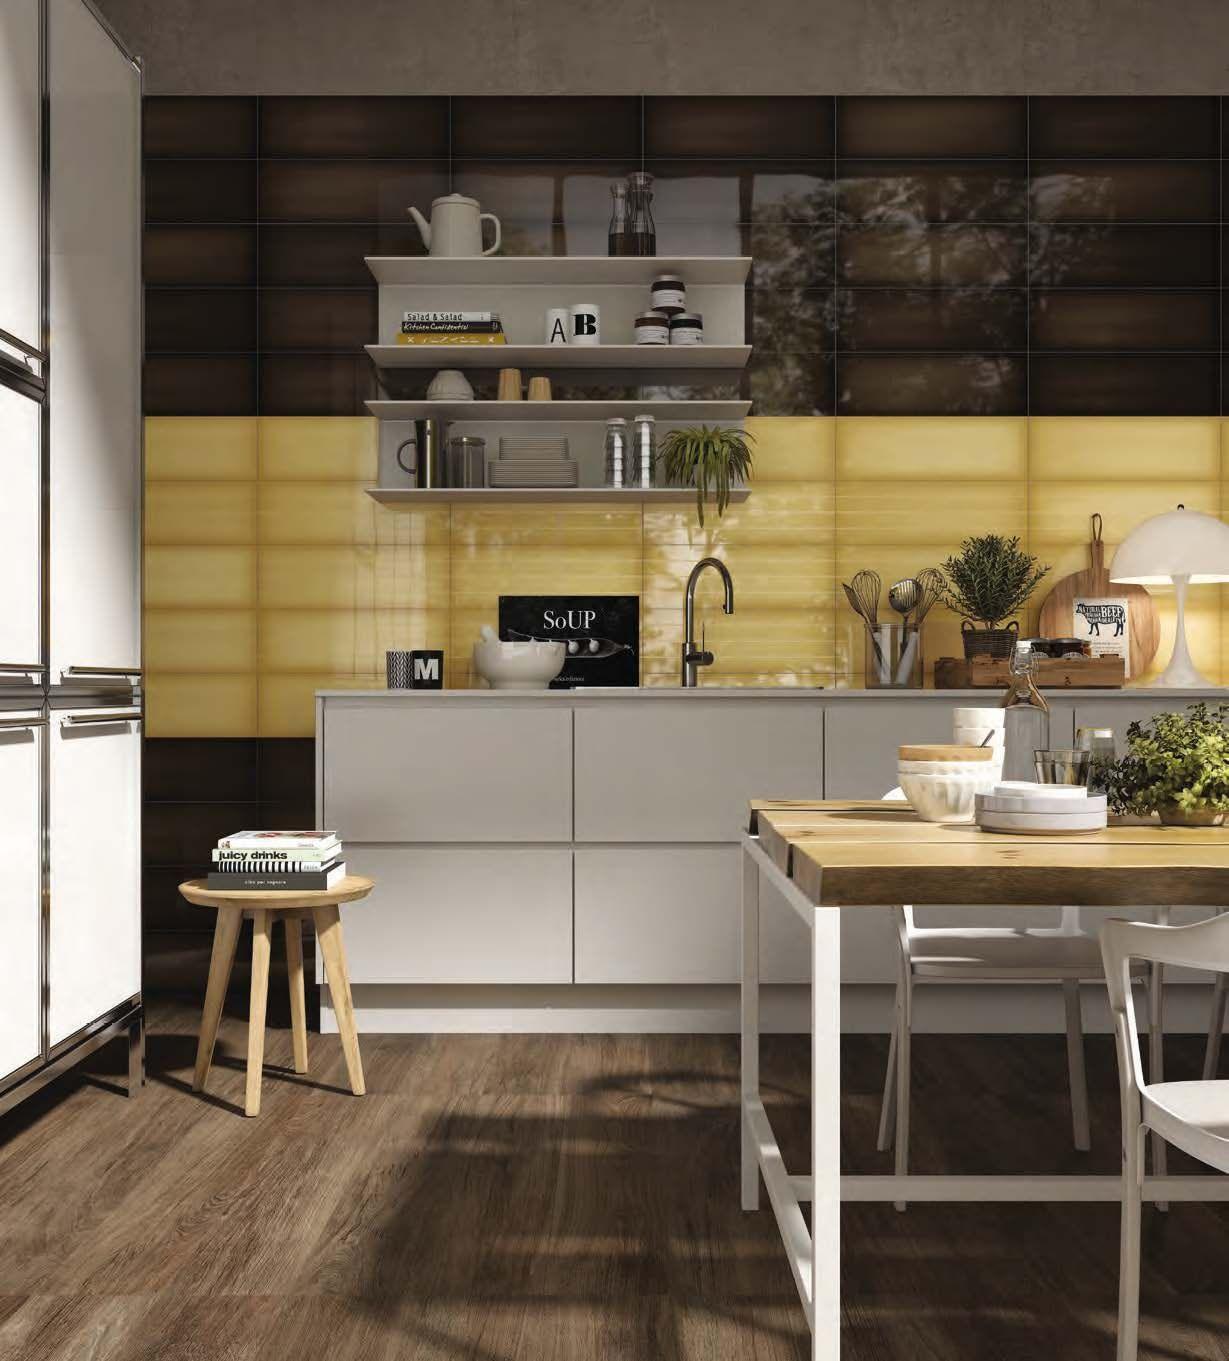 Brown and yellow tile kitchen backsplash